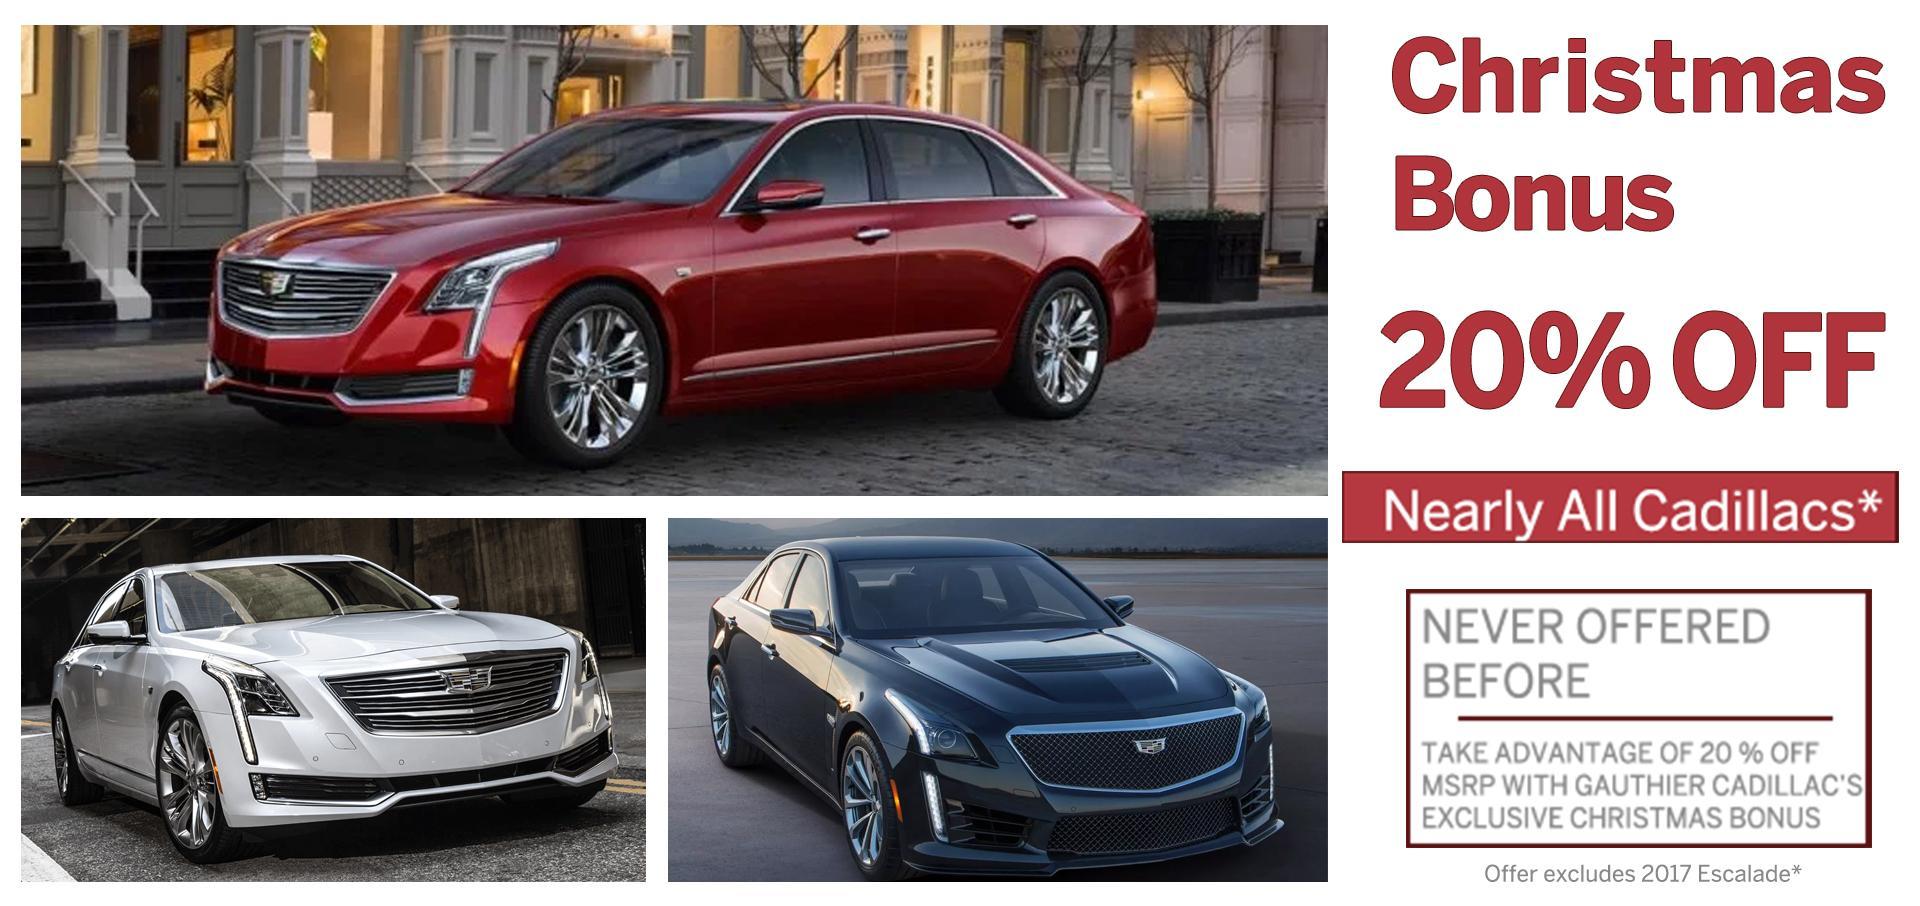 Cadillac 20% Off - Christmas Bonus